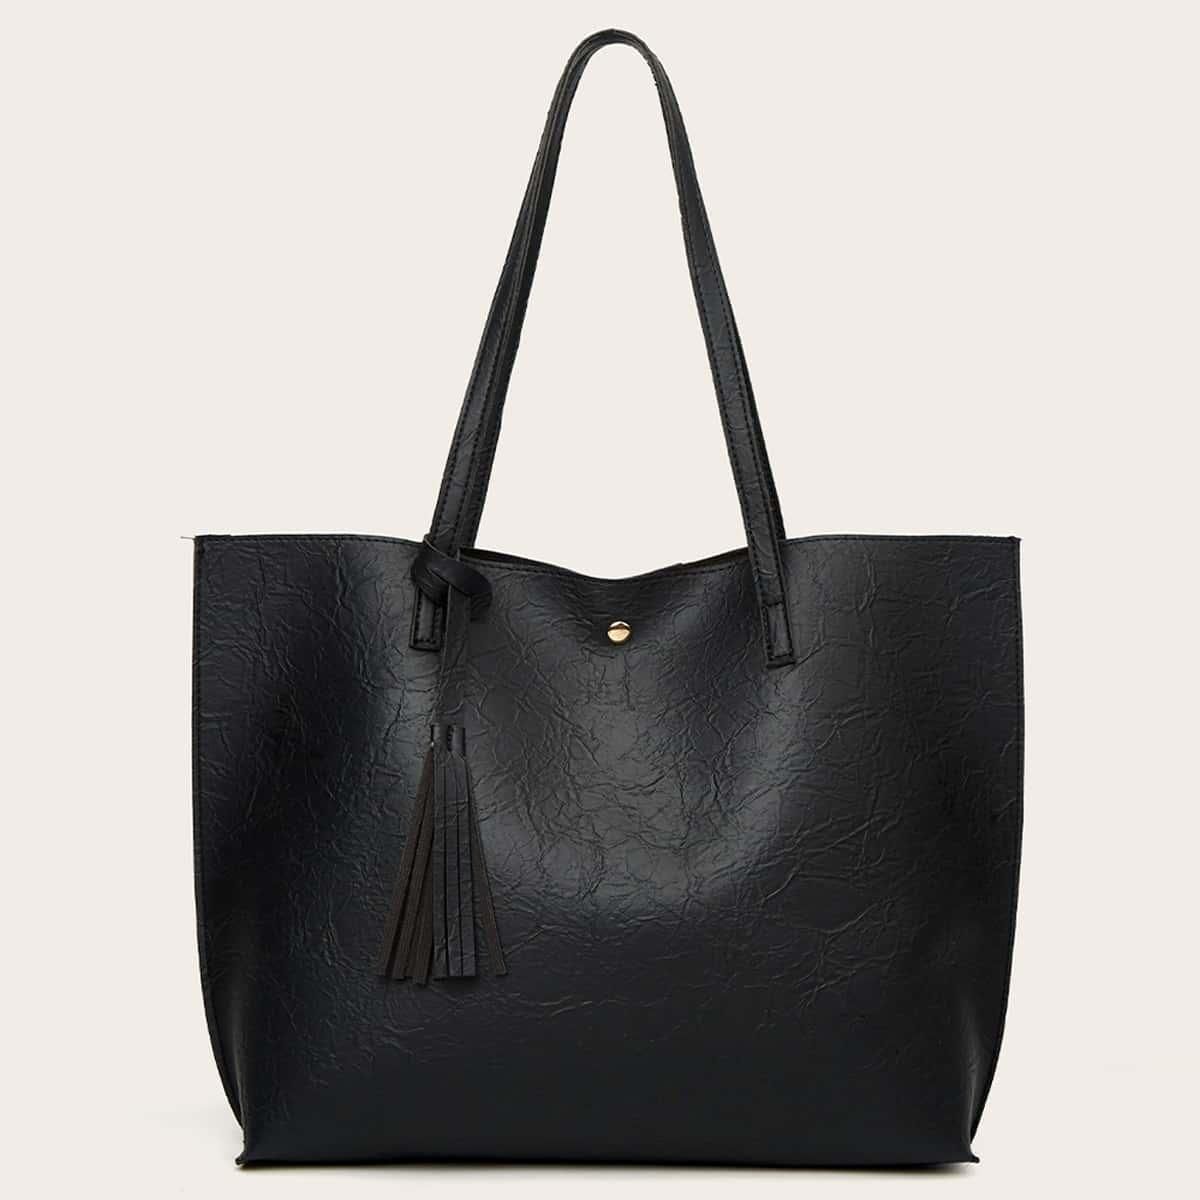 Minimalist Tassel Decor Tote Bag, SHEIN  - buy with discount